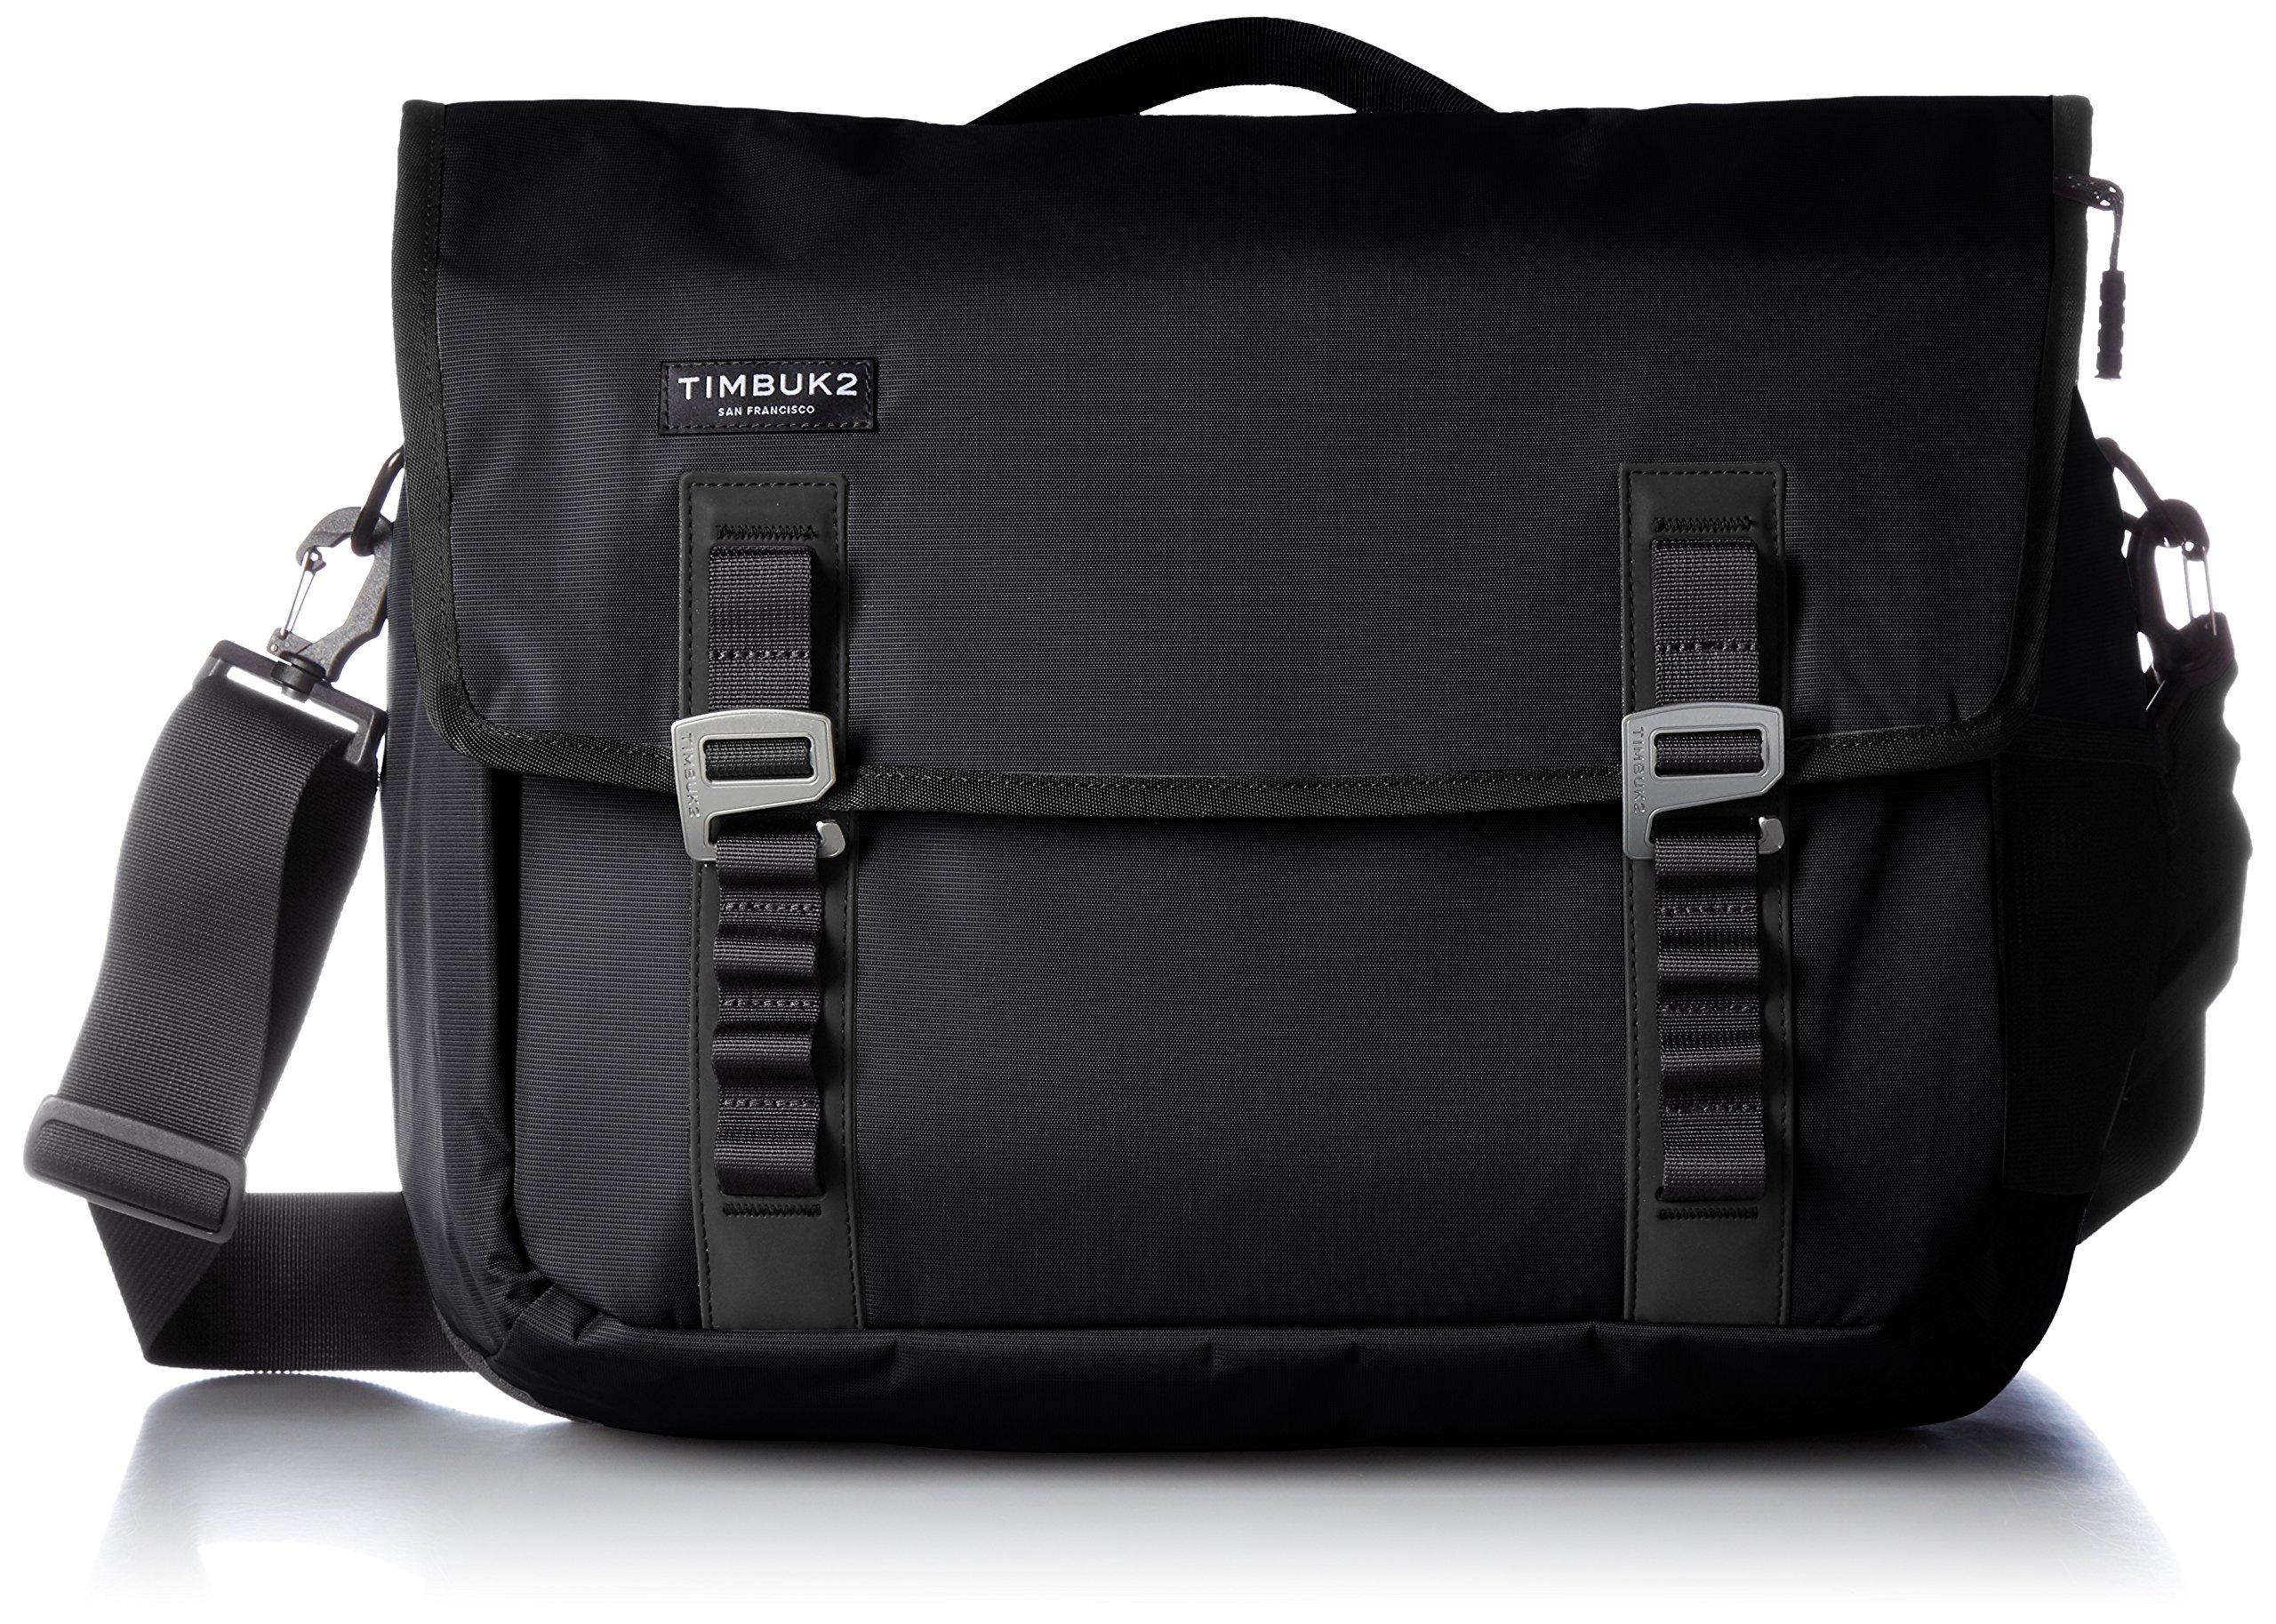 Timbuk2 Command Travel-Friendly Messenger Bag, Jet Black, Medium